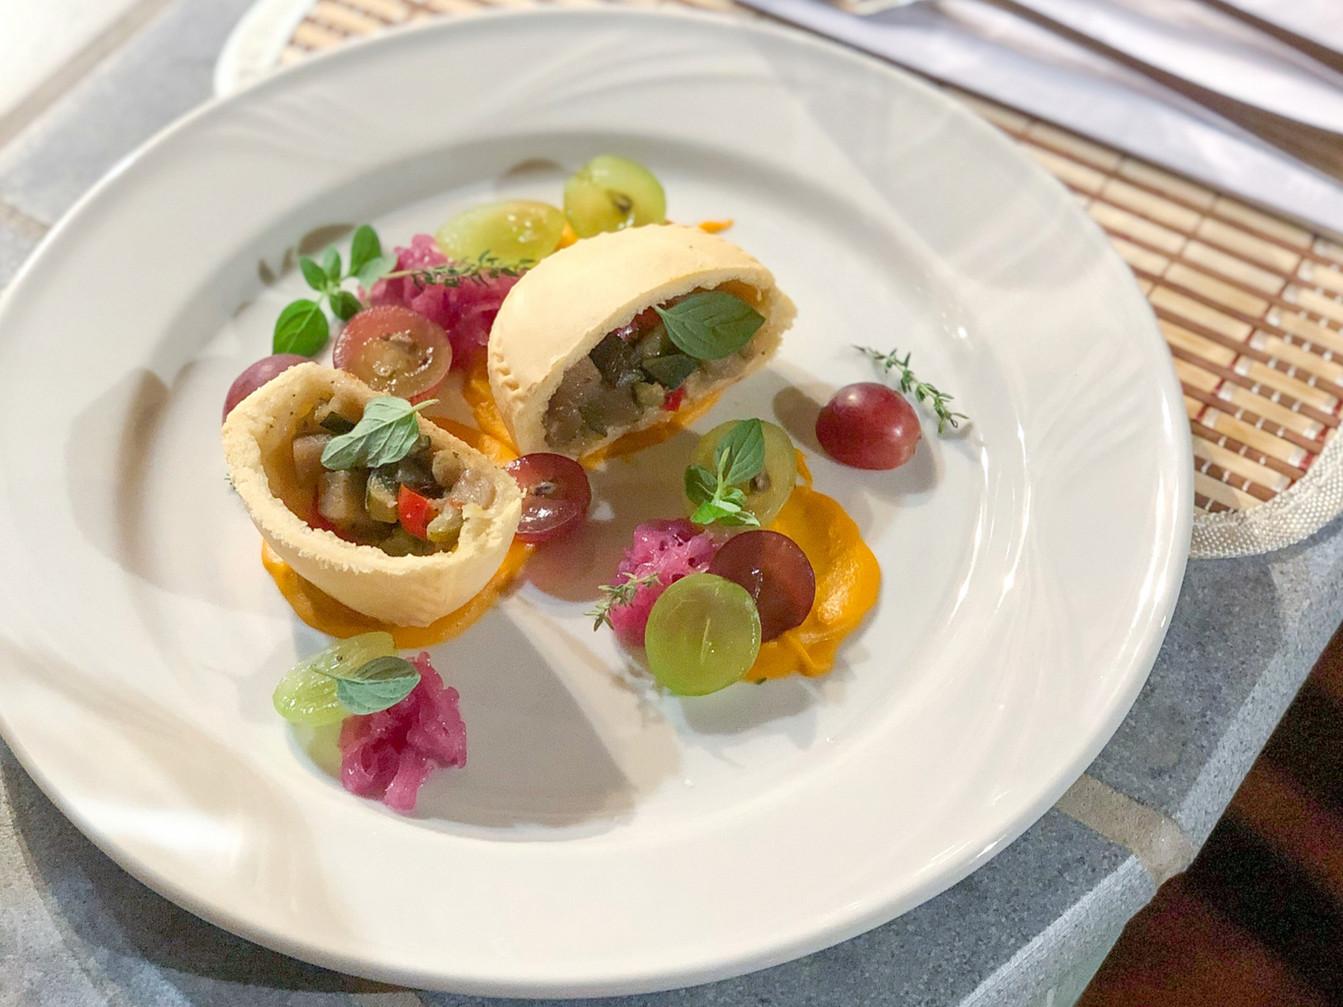 Panada Vegan di verdure, carote alle arance, marmellata di cipolla rossa e uva Cannonau